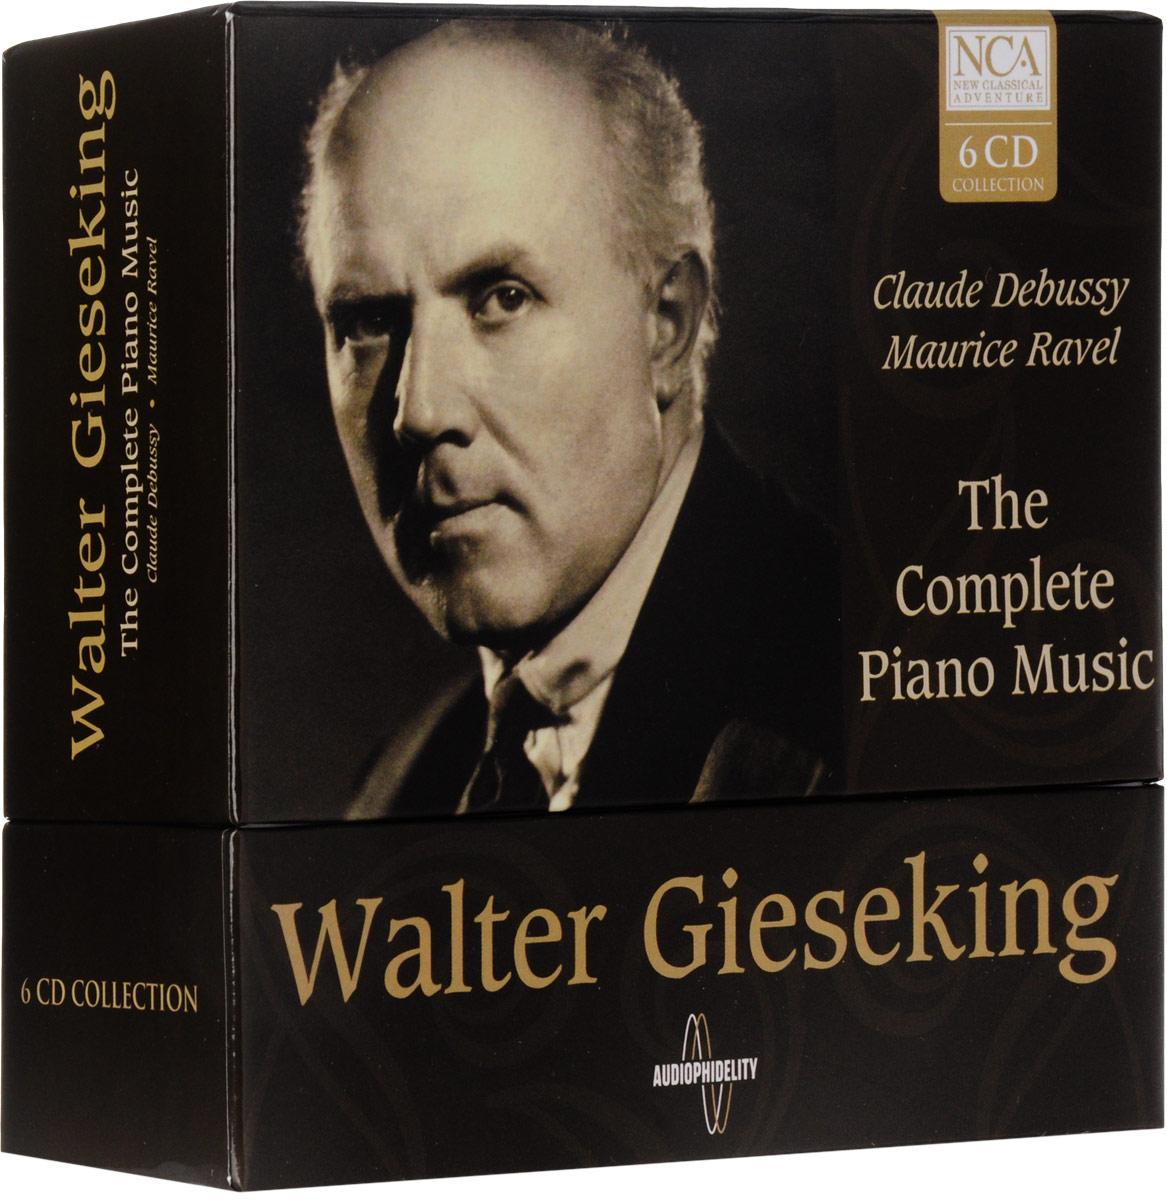 Вальтер Гизекинг Walter Gieseking. Conplete Piano Music (6 CD)